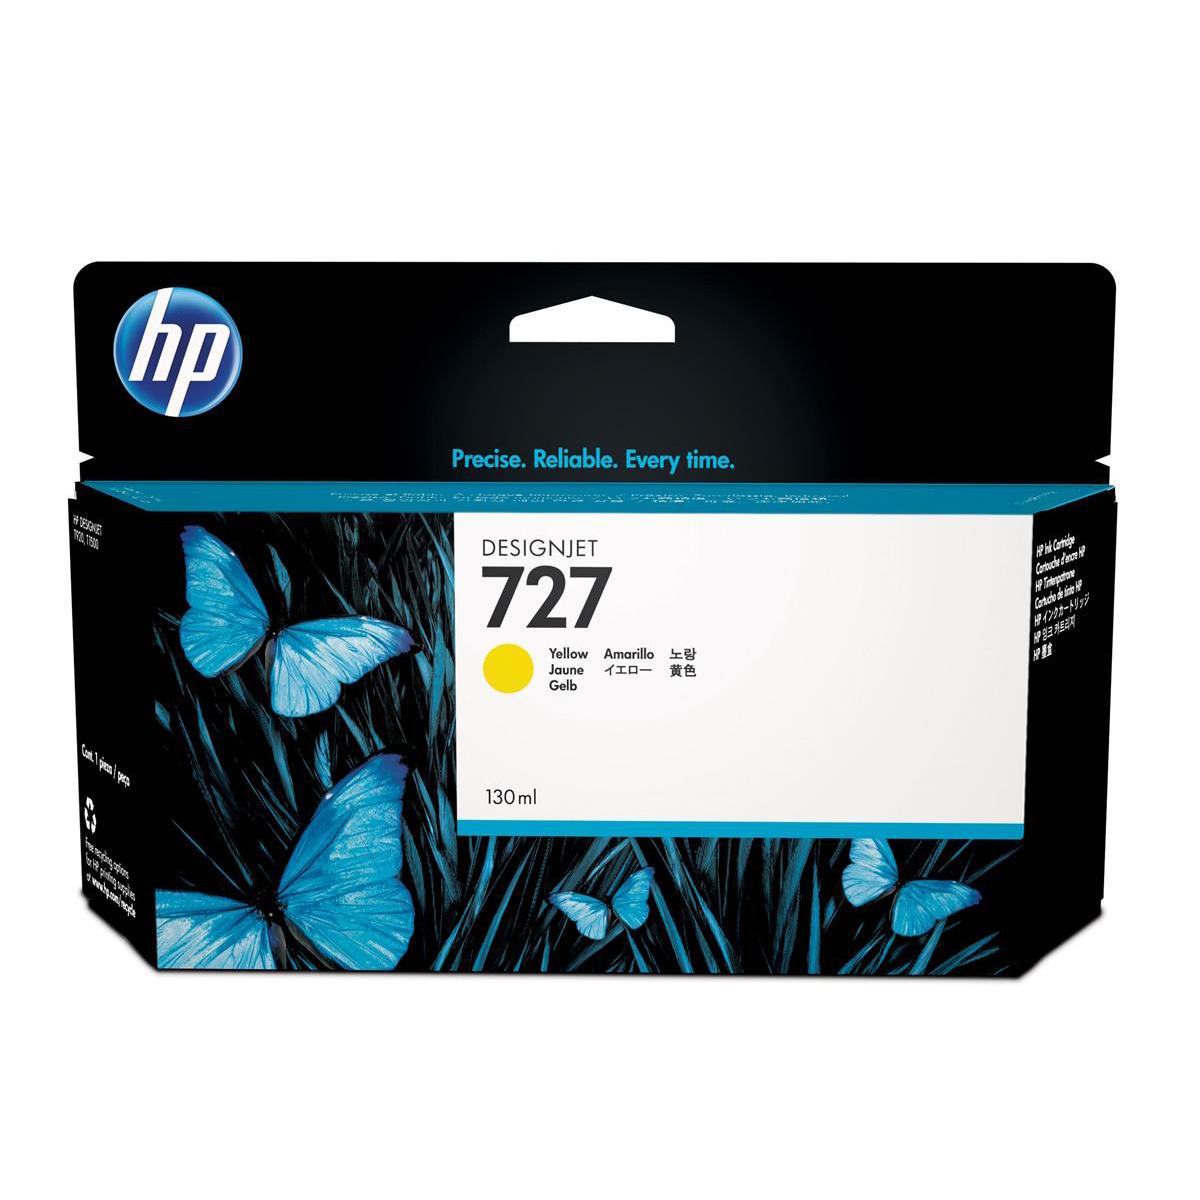 Ink cartridges Hewlett Packard HP No.727 Designjet Inkjet Cartridge 130ml Yellow Ref B3P21A